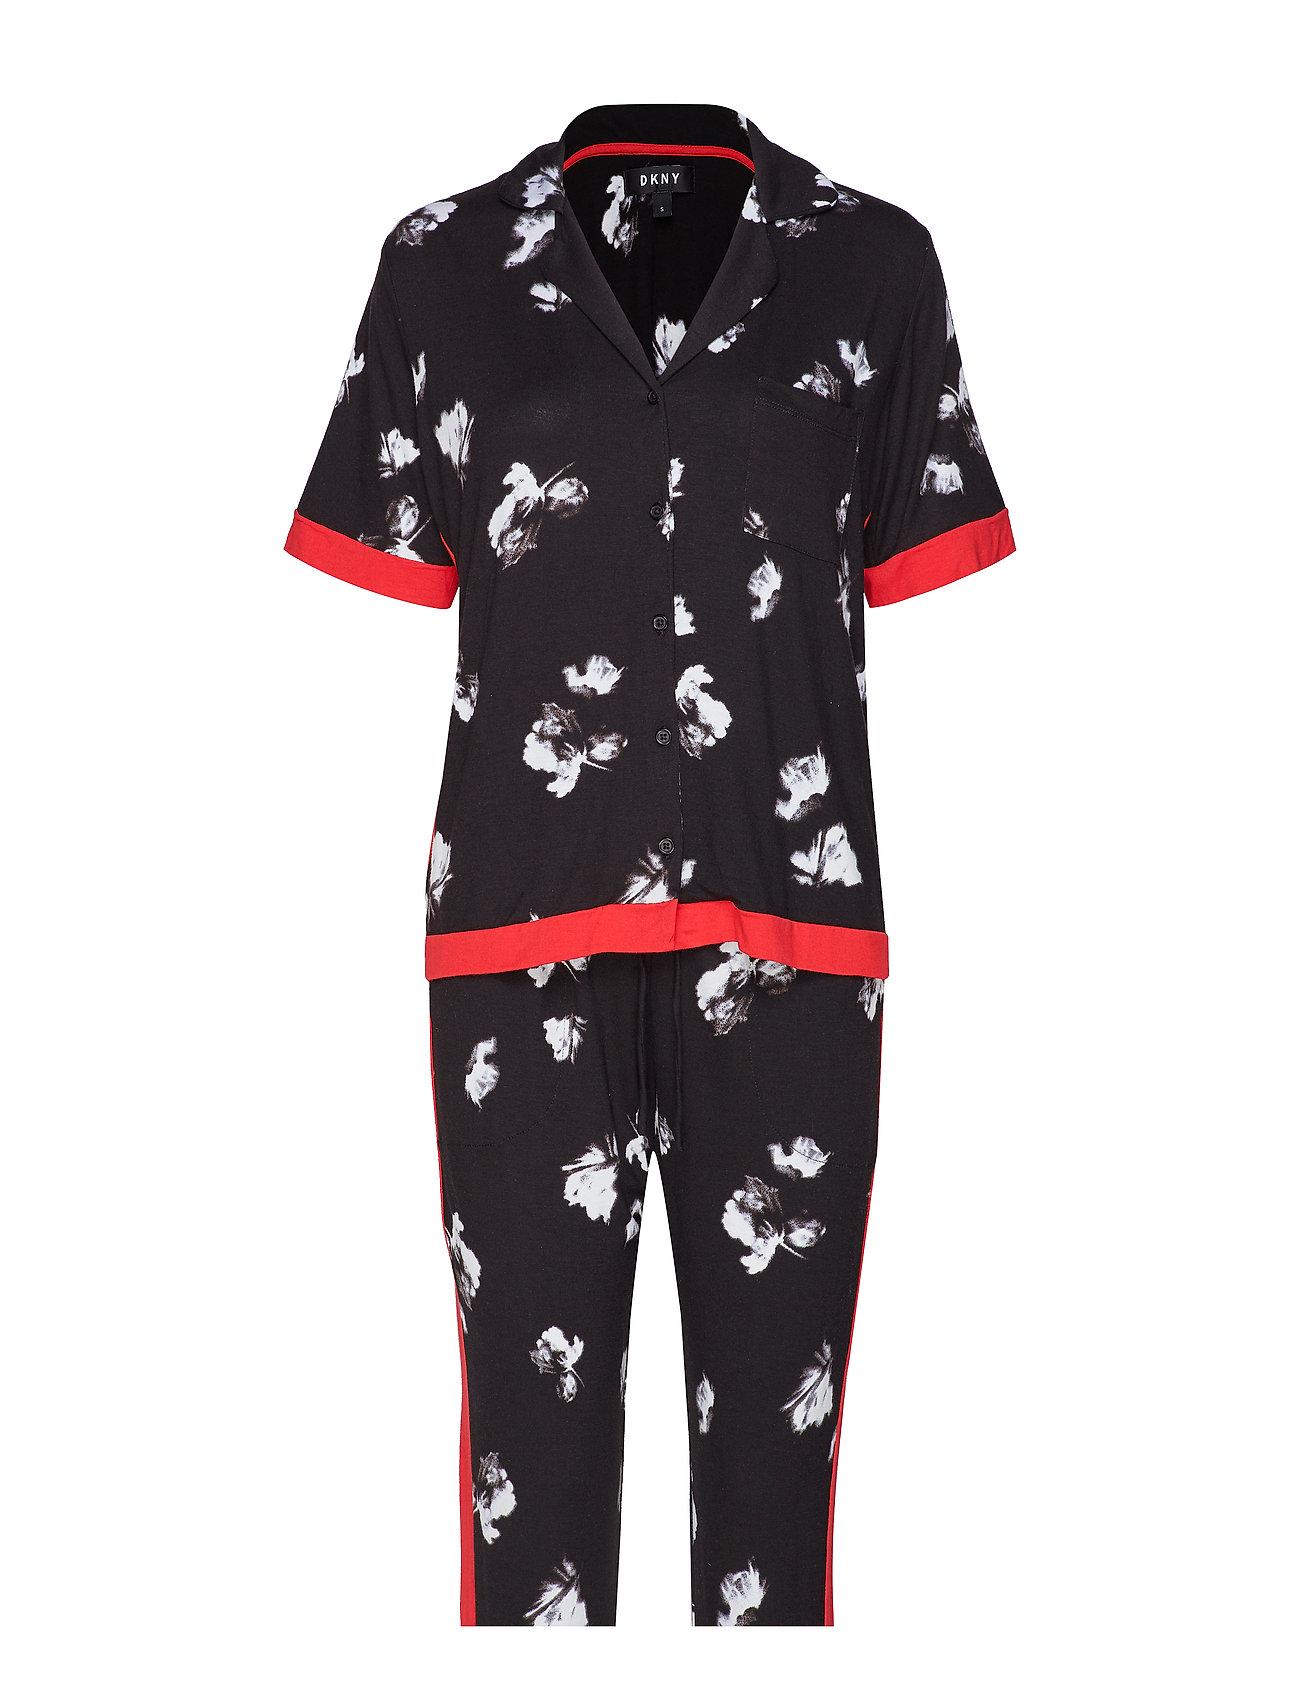 DKNY Homewear DKNY MODERN REFL. TOP & CAPRI PJ SET - BLACK FLORAL